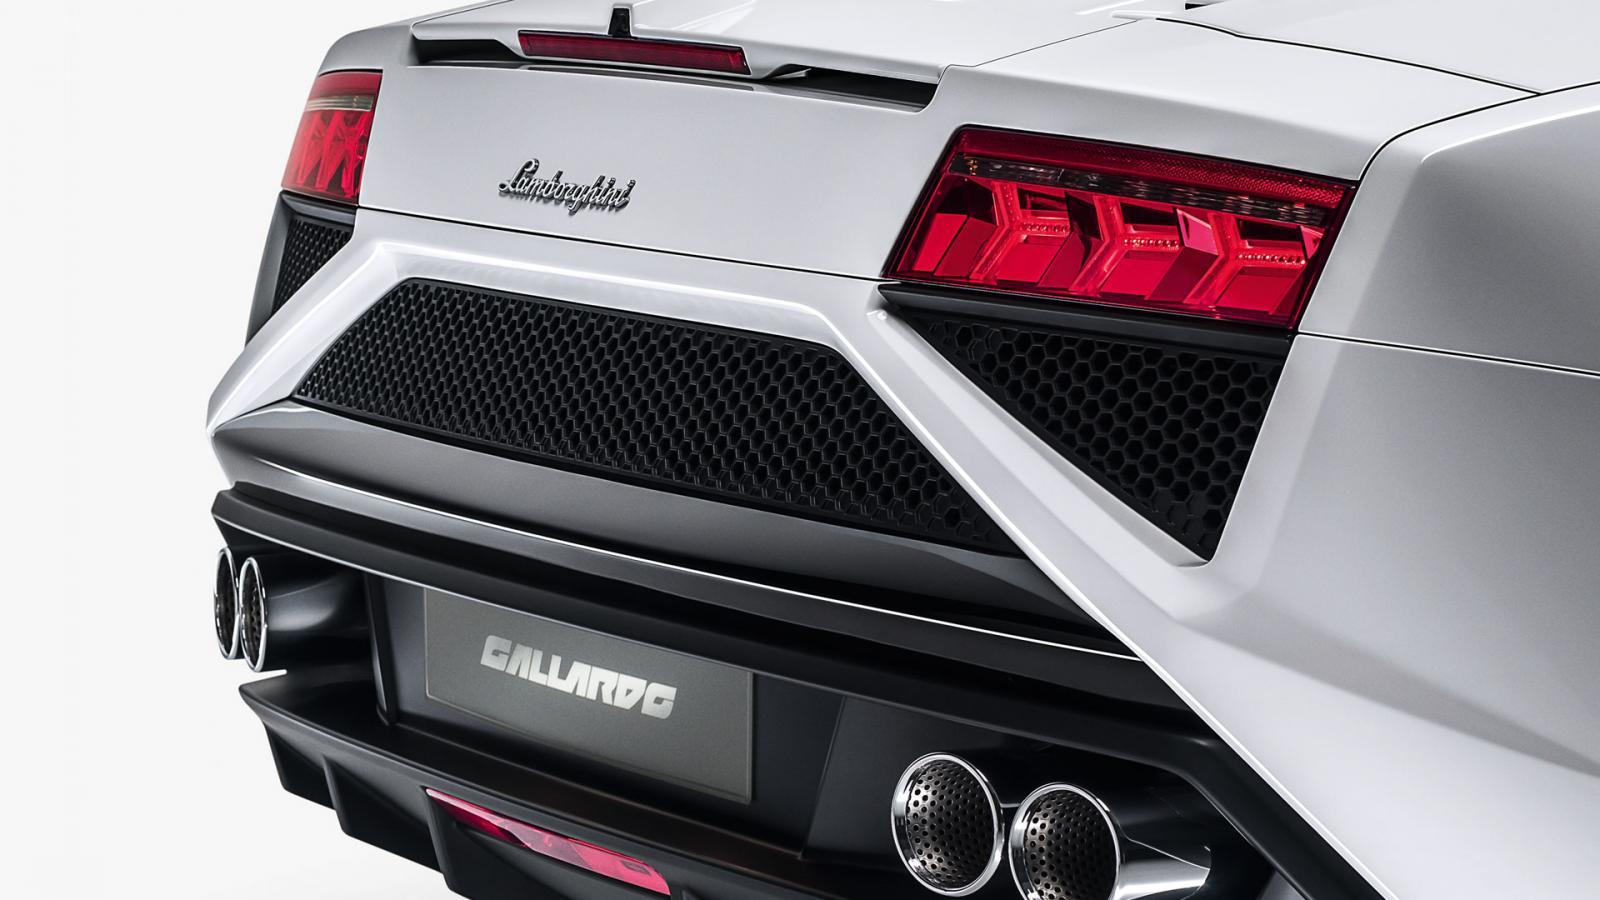 2013 Lamborghini Gallardo Spyder 10 | New Cars Review For 2013